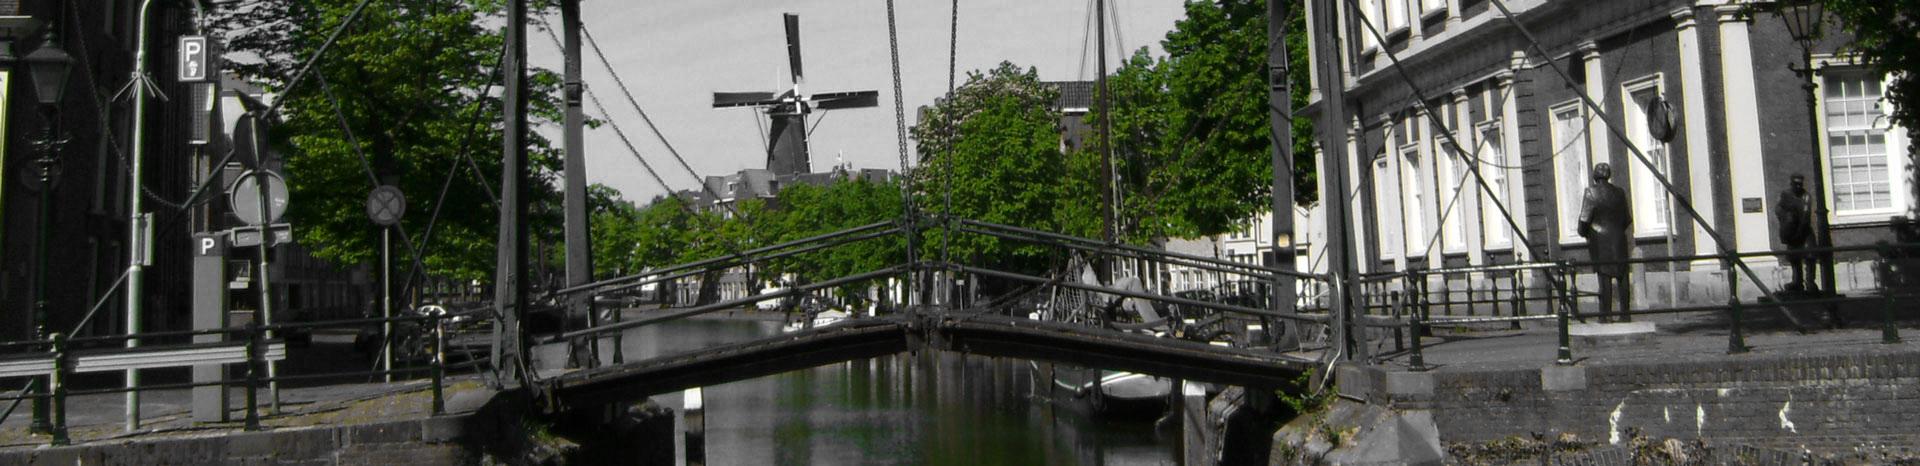 Letselschade advocaat Schiedam | LetselPro